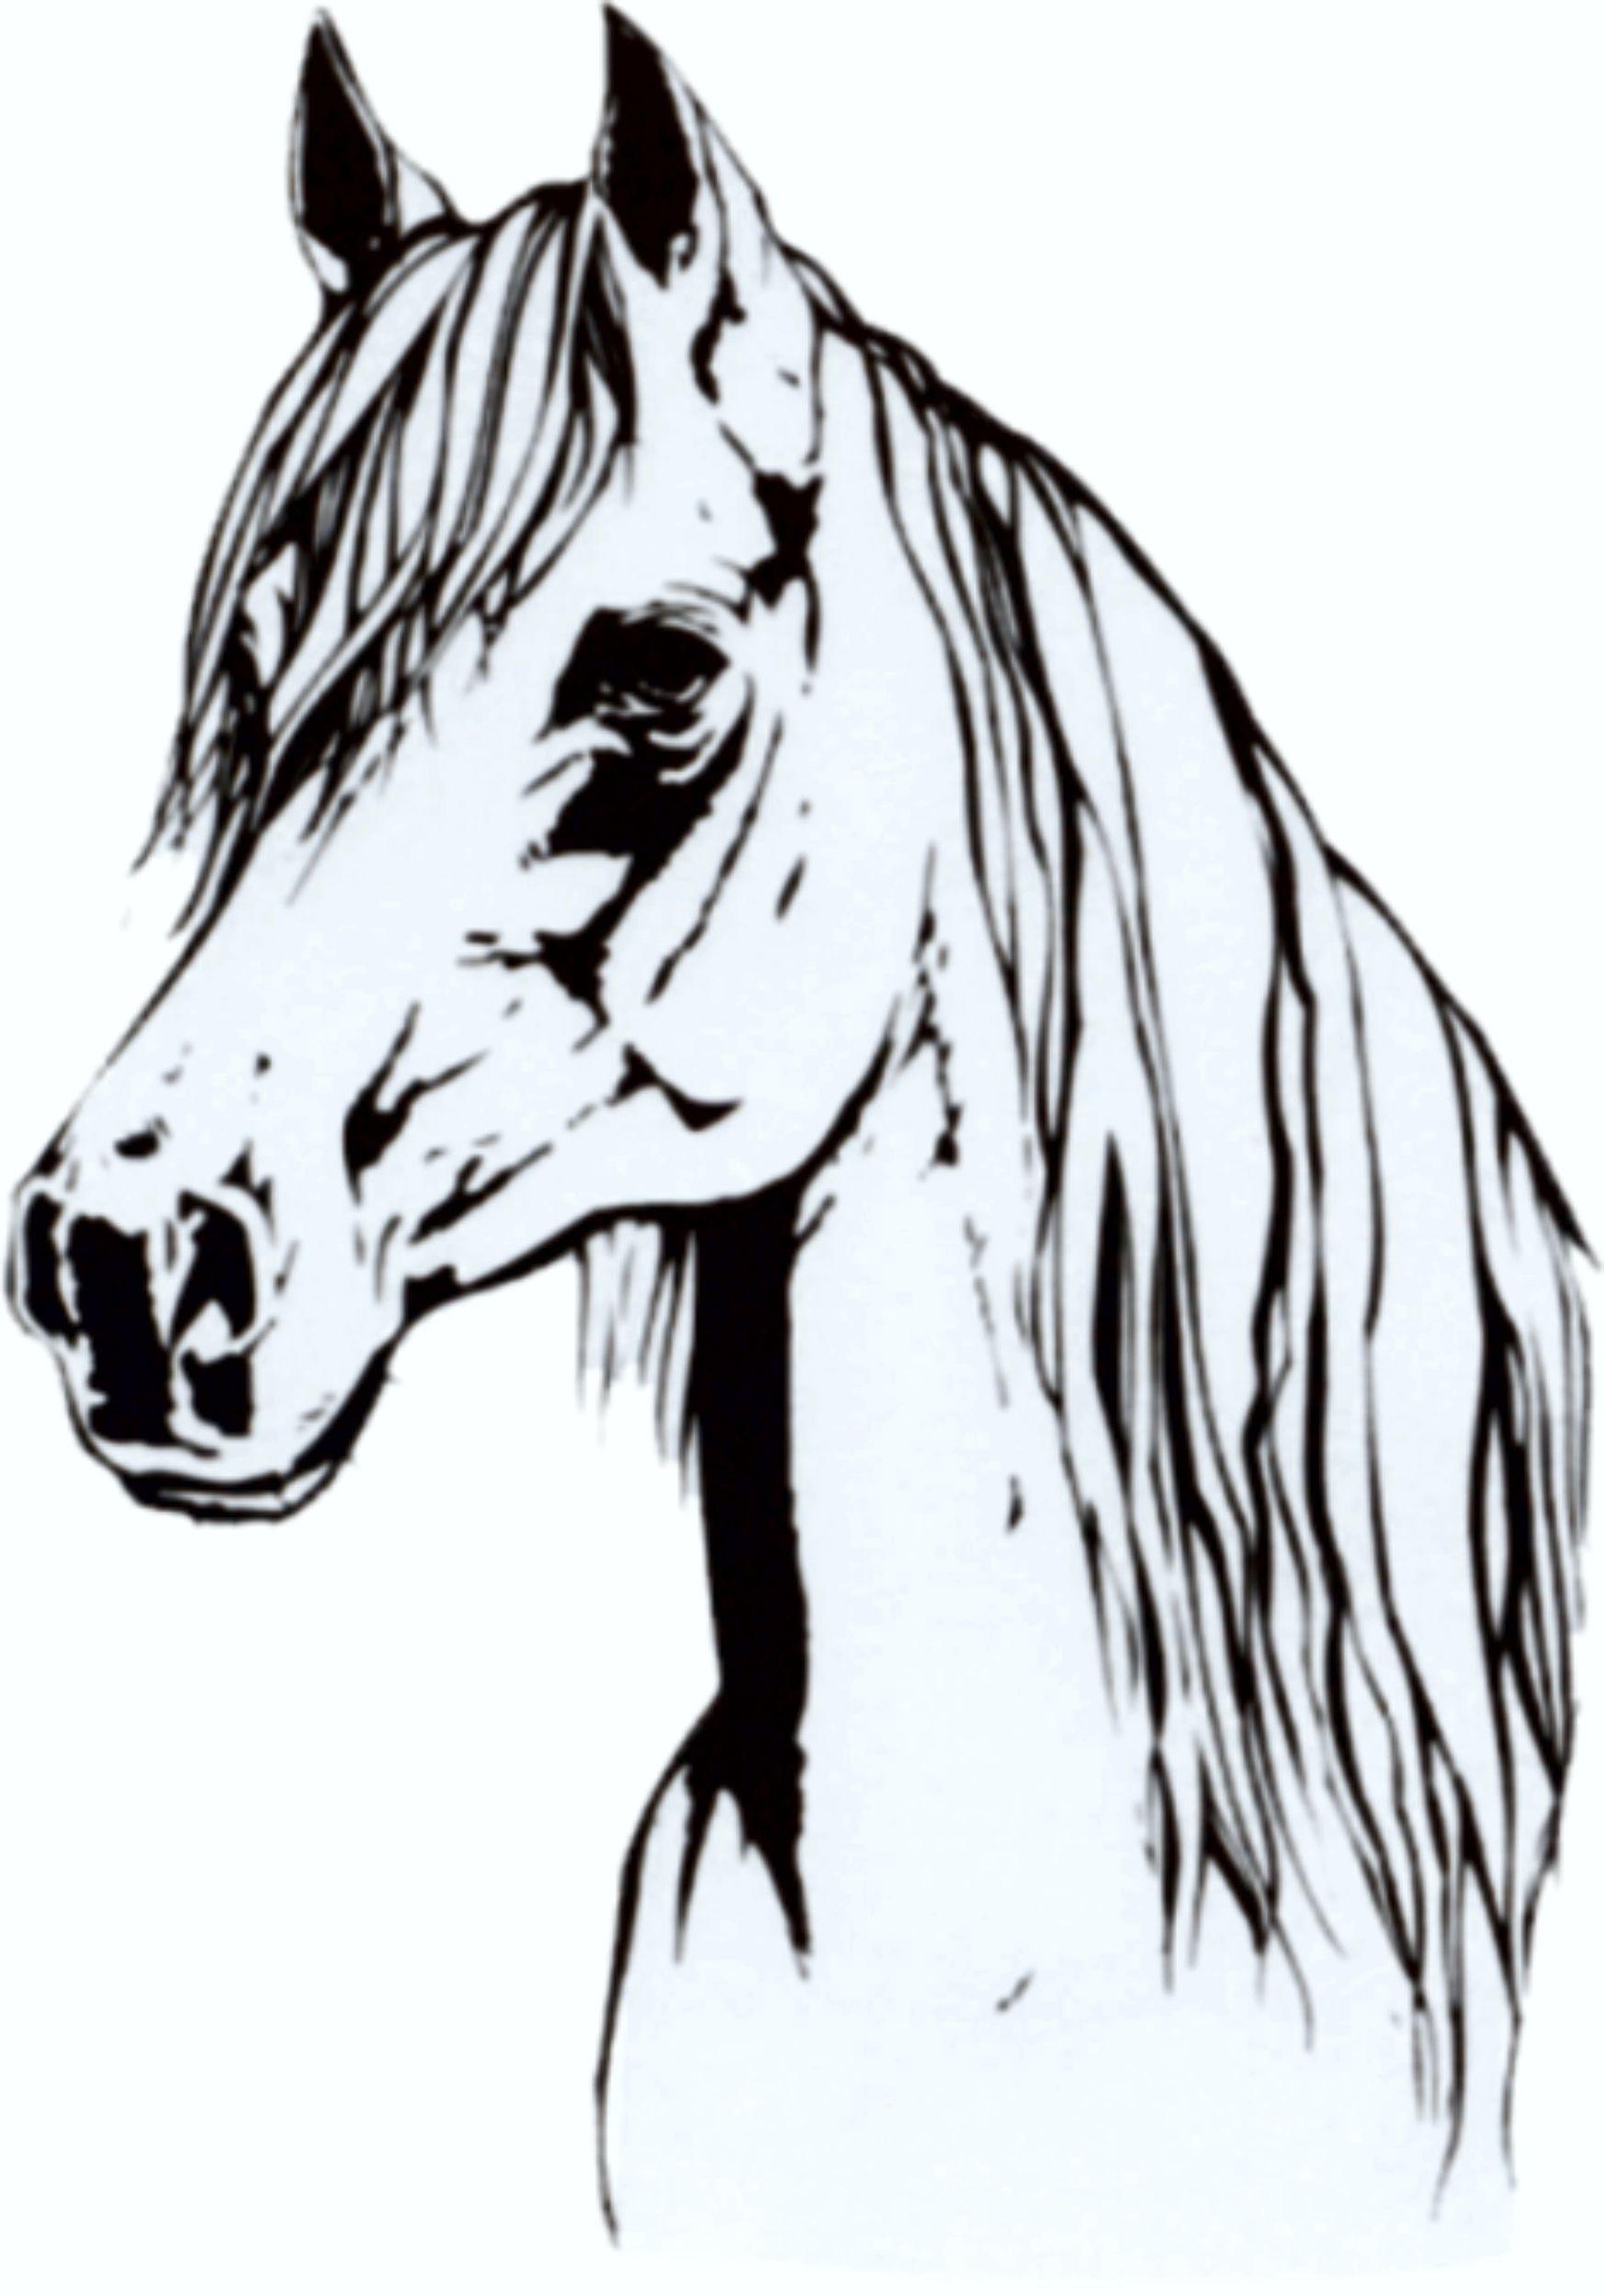 Autocollant cheval 120 x 100 mm – Bild 1